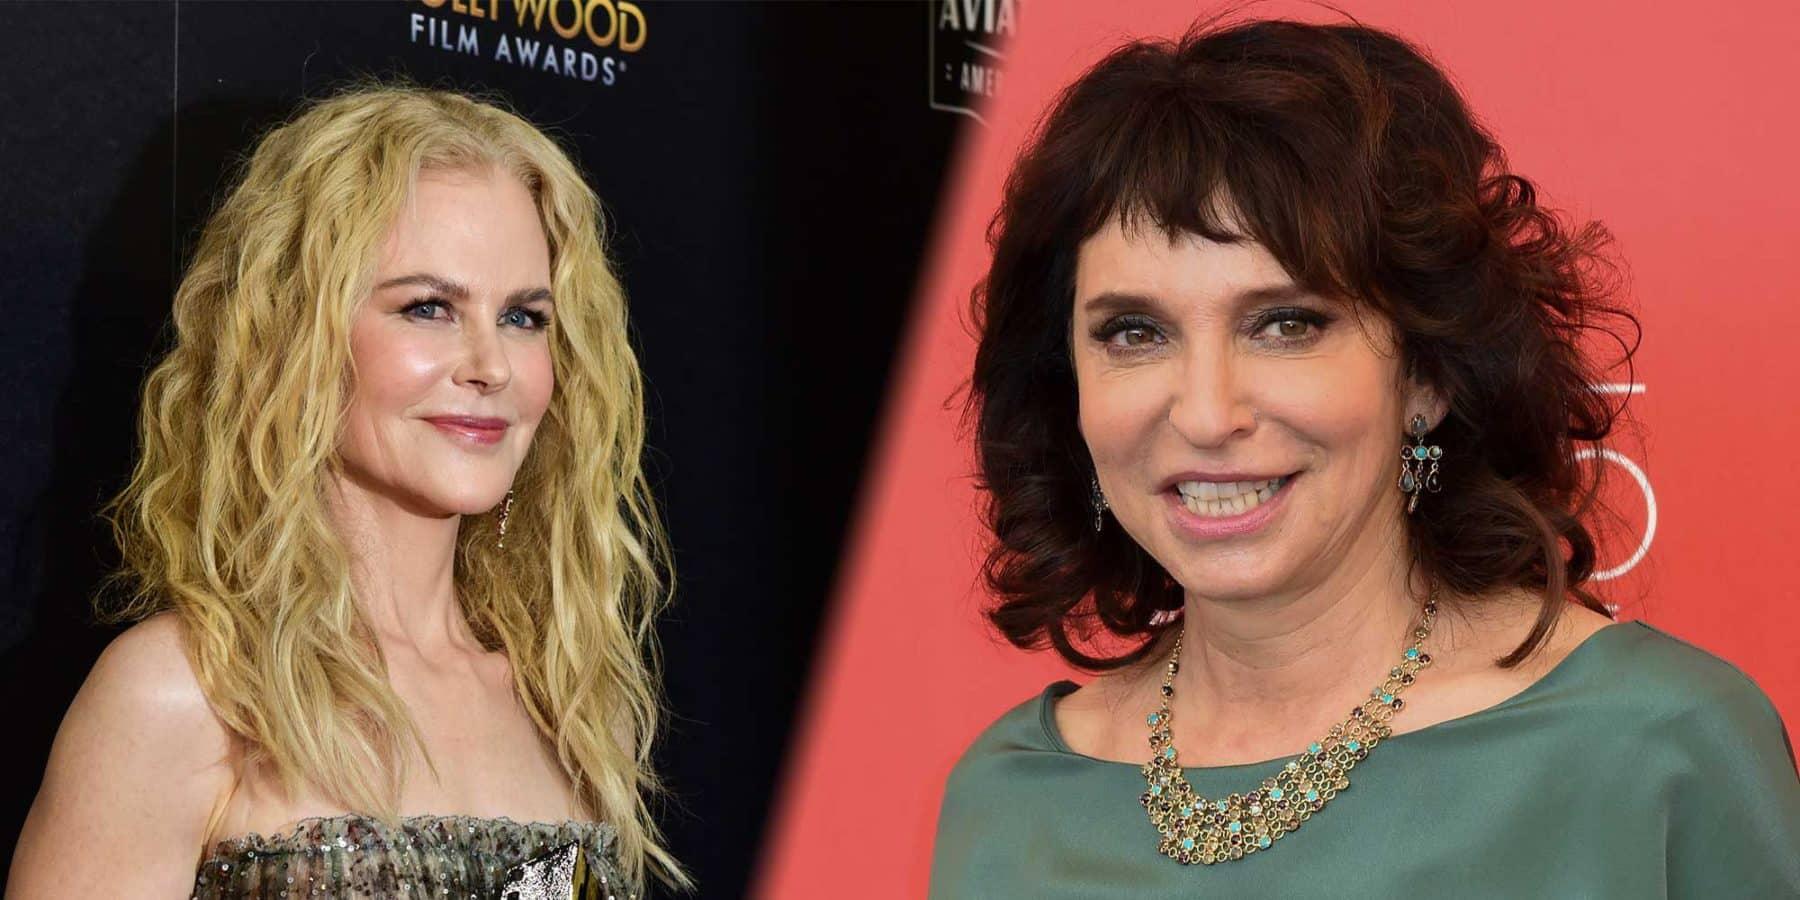 Susanne Bier dirigirá a Nicole Kidman en miniserie The Undoing de HBO proyecto de alto perfil del canal